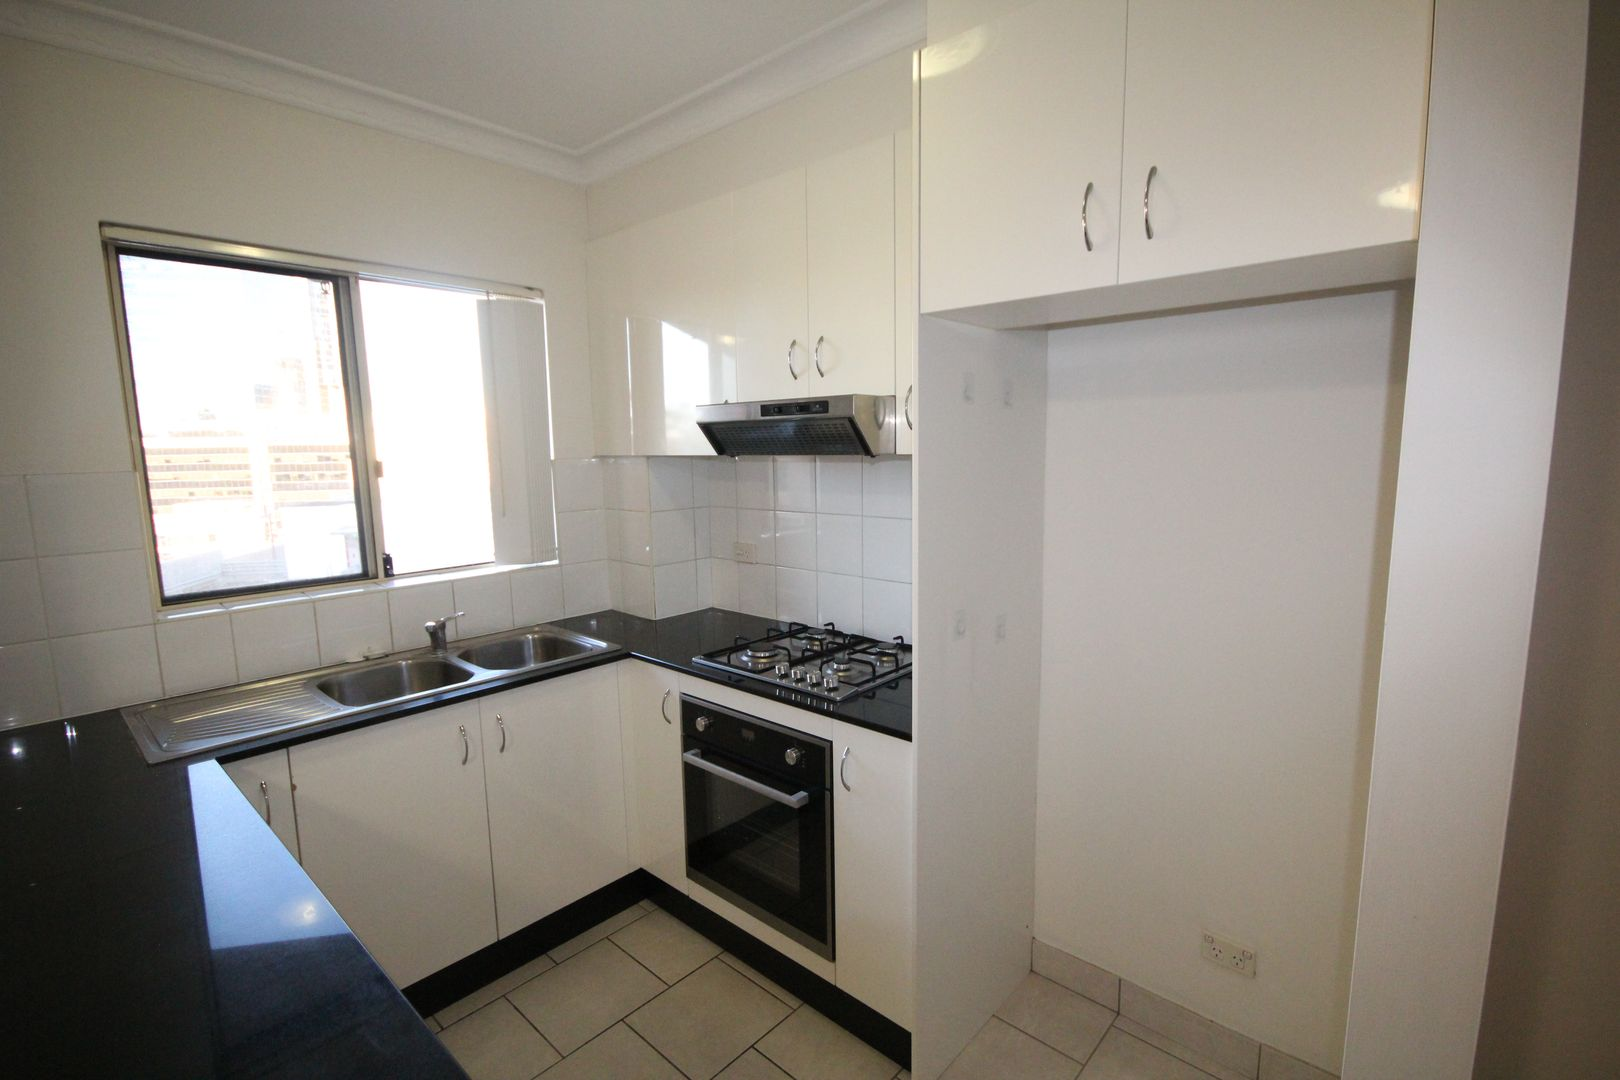 31/1 Macquarie Street, Parramatta NSW 2150, Image 1